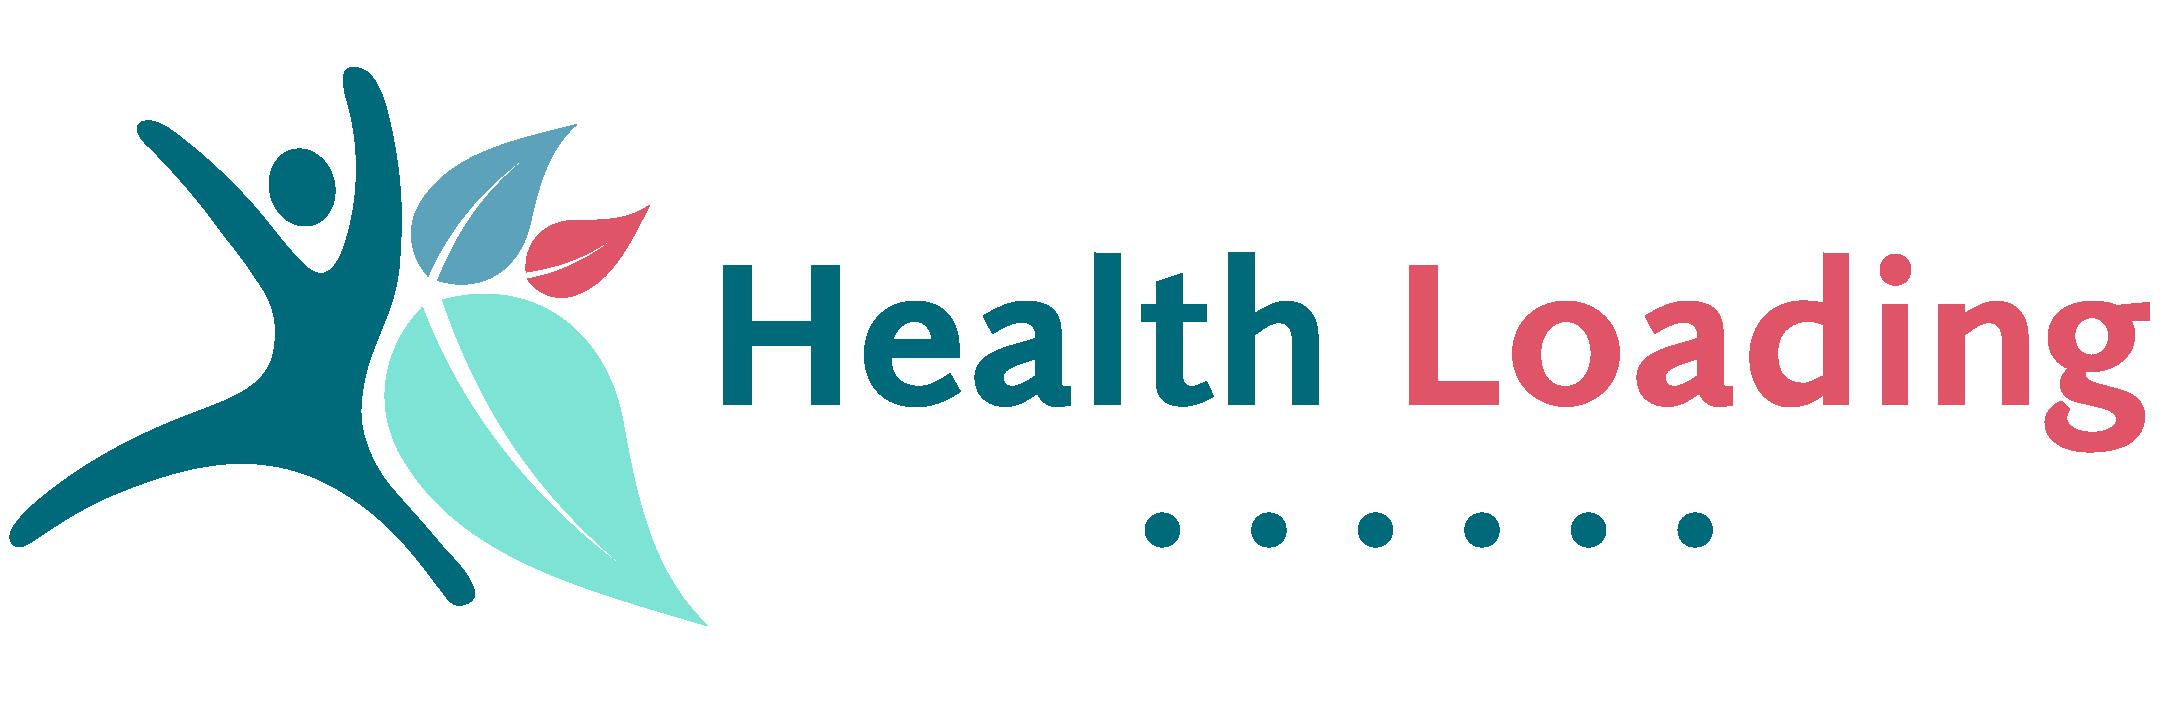 HealthLoading - Ιατρικά Νέα